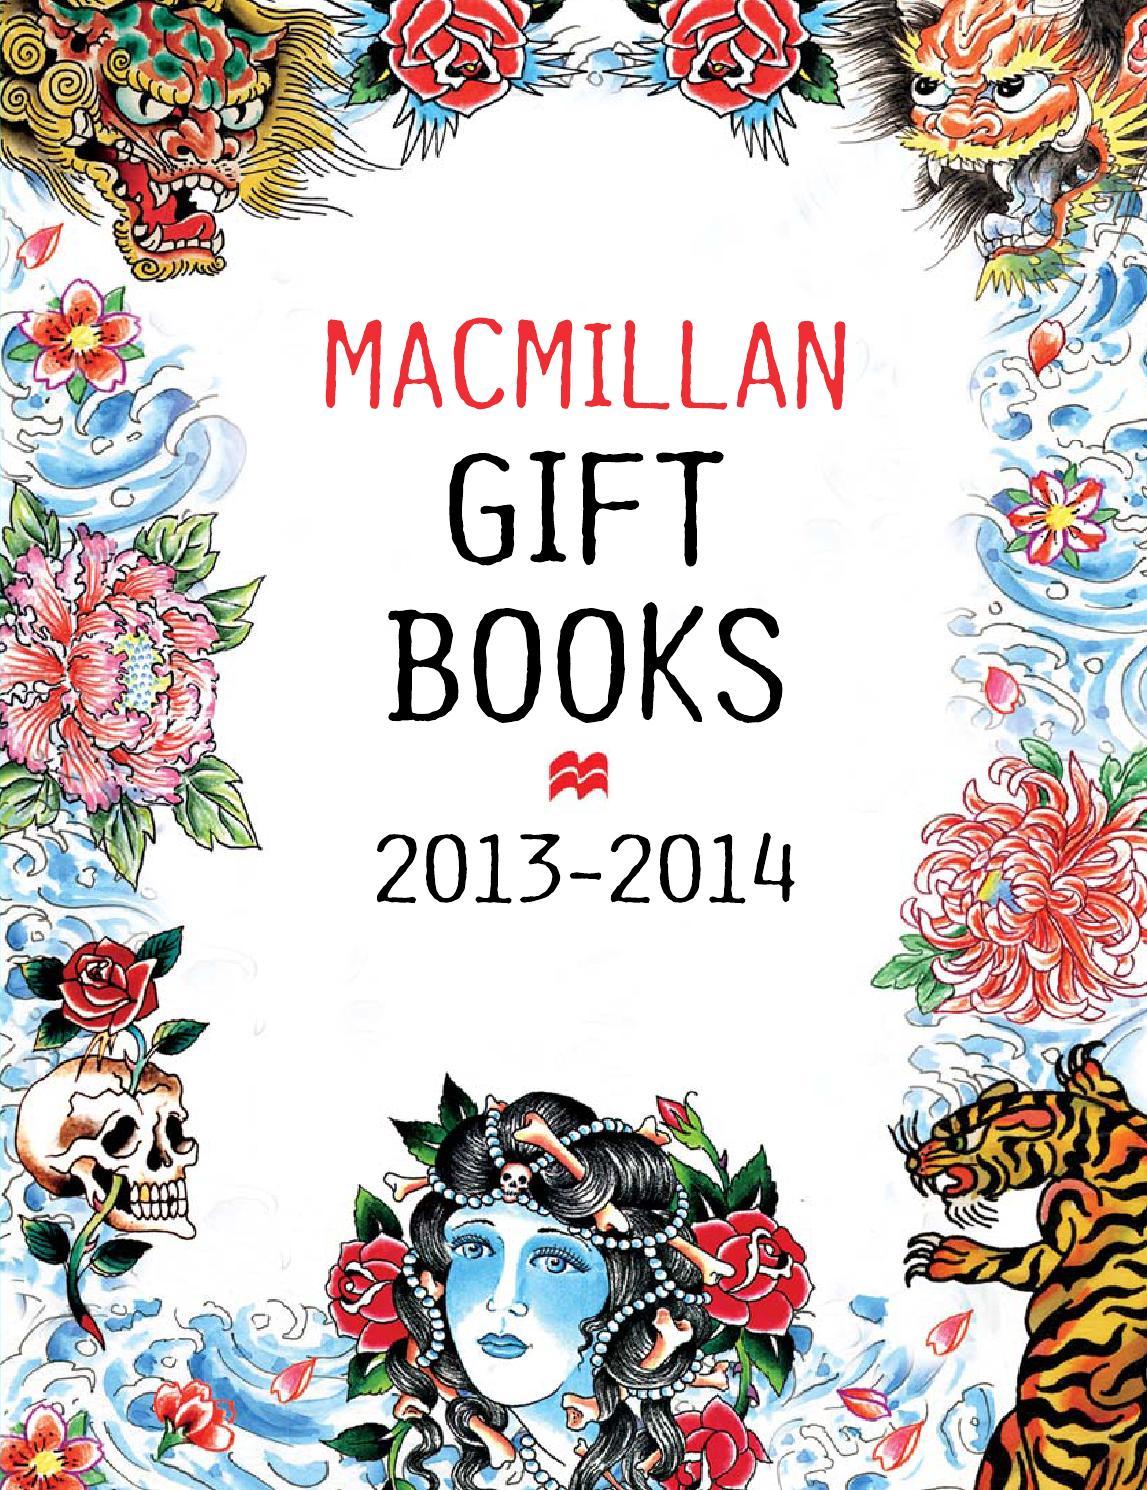 9f0c249c0ee4c Macmillan Books Gift catalog 2013 2014 by Sweetgrass Sales ...